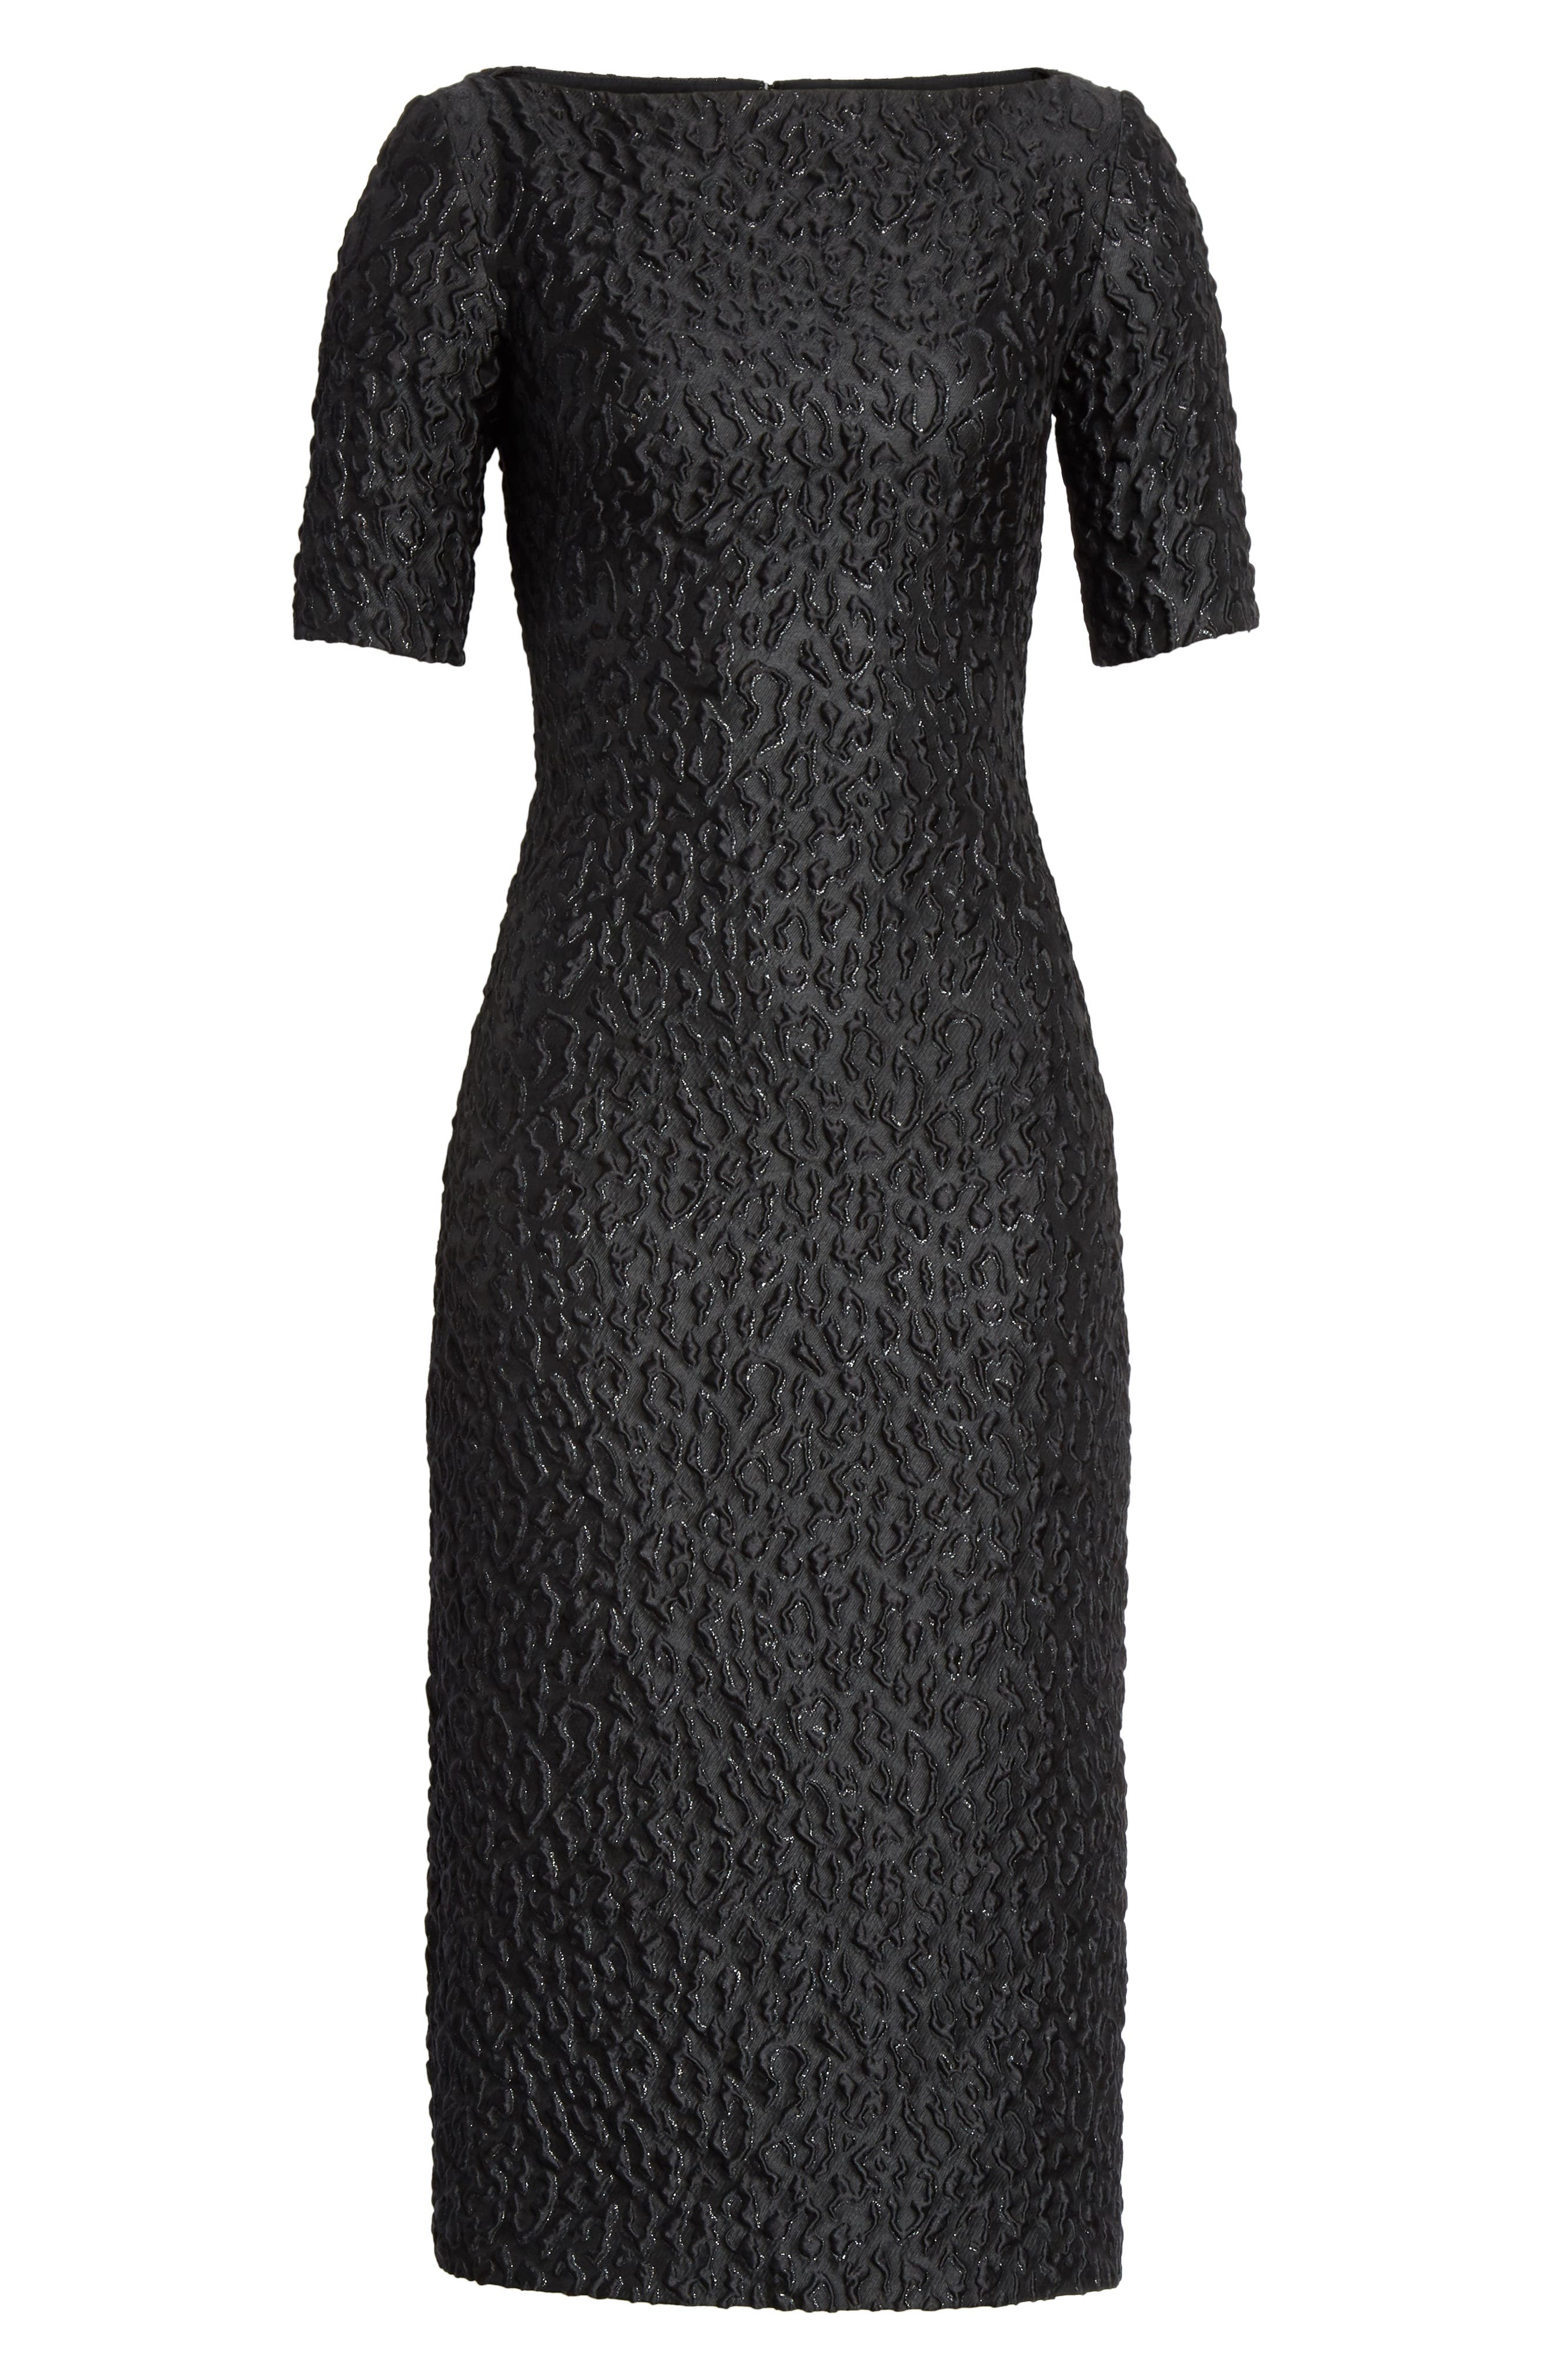 BRANDON MAXWELL, Leopard Jacquard Sheath Dress, Alternate thumbnail 7, color, BLACK